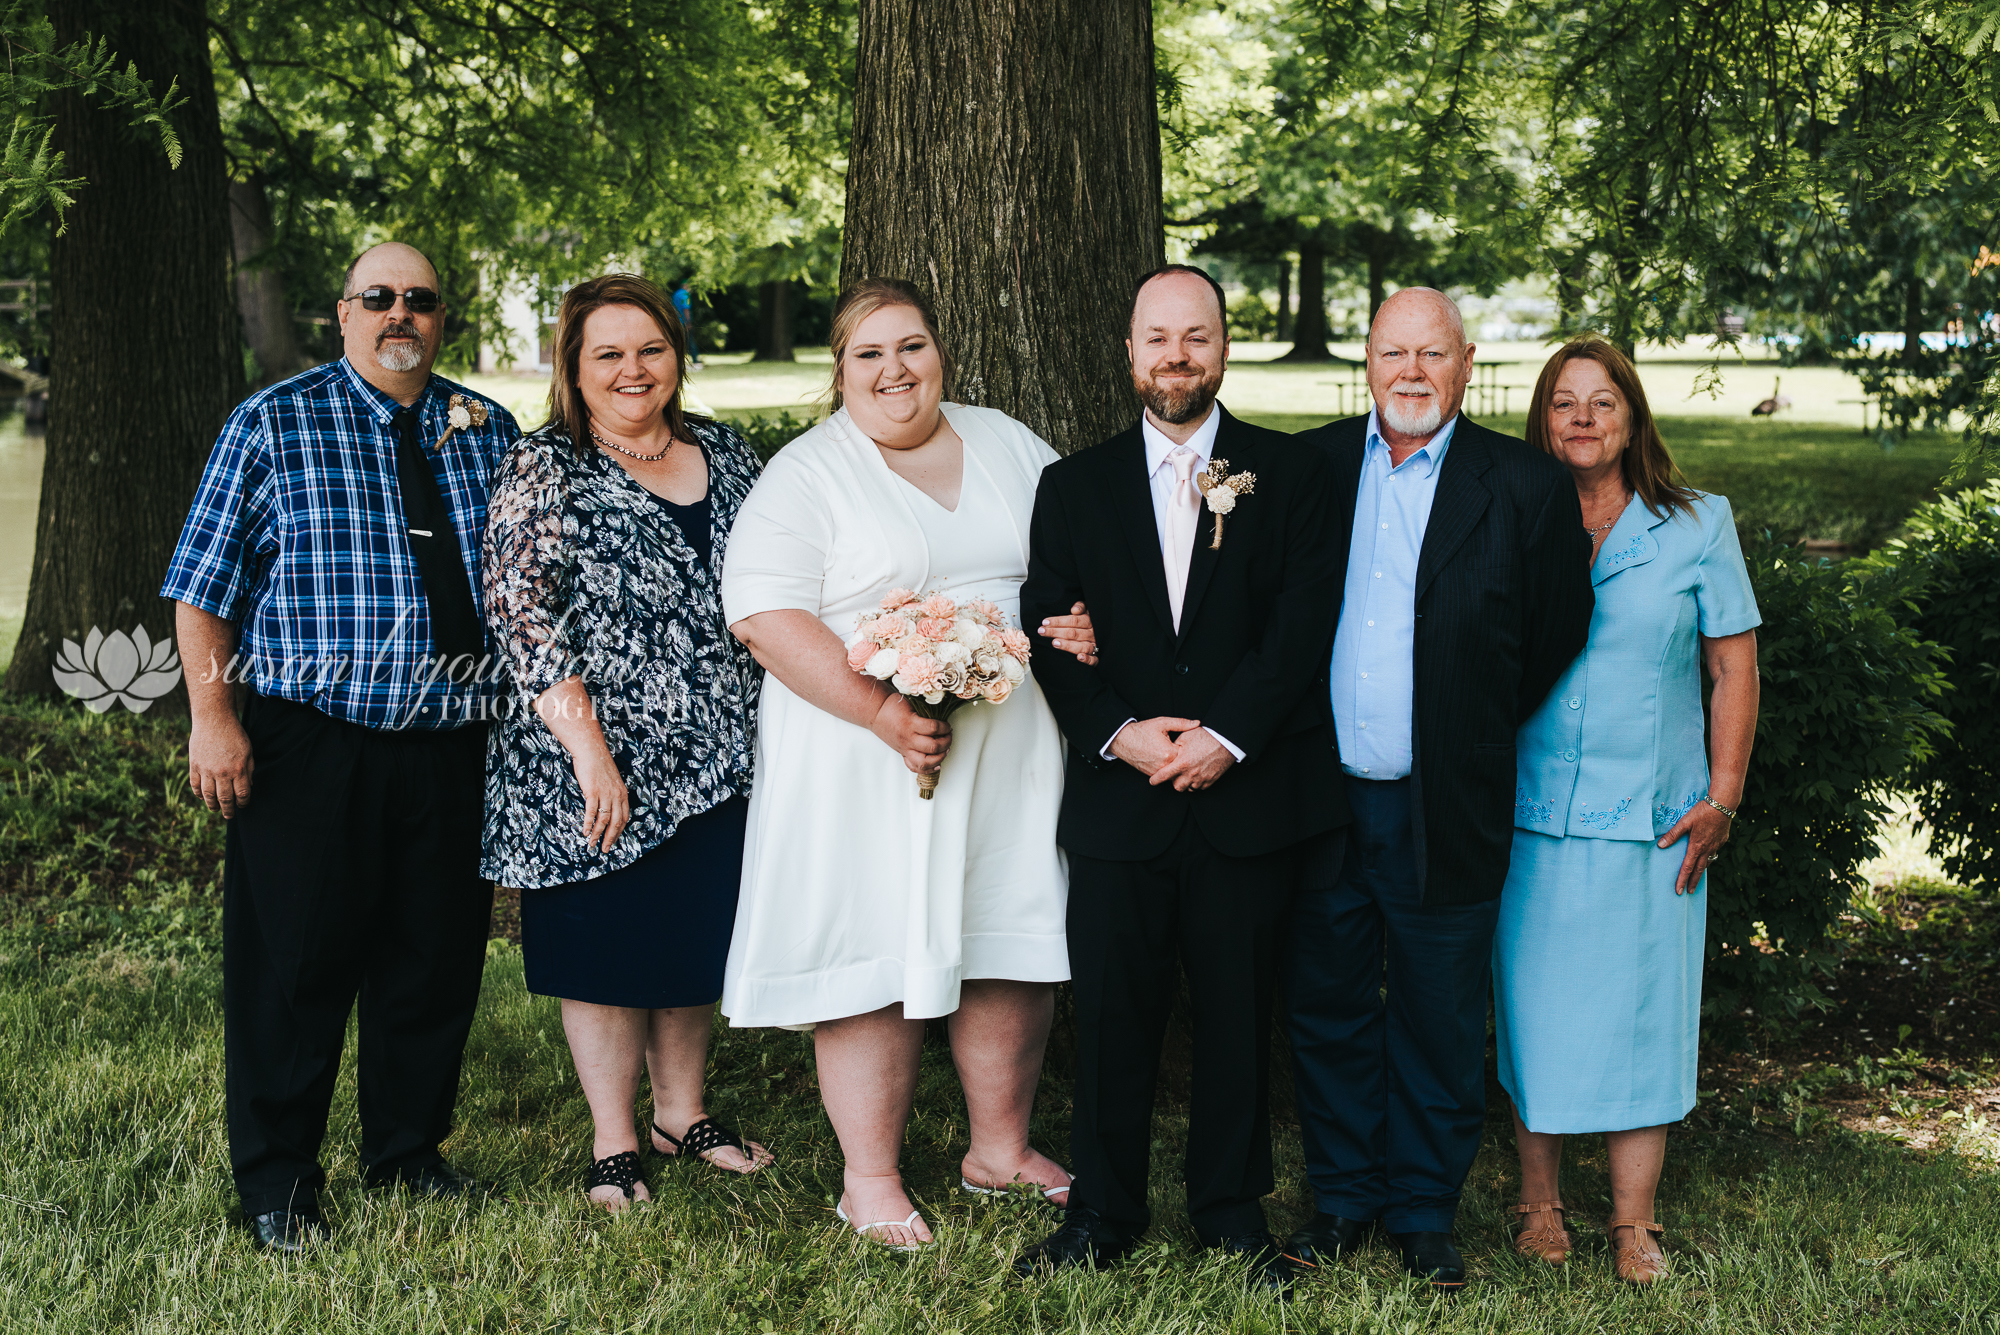 Bill and Sarah Wedding Photos 06-08-2019 SLY Photography -54.jpg